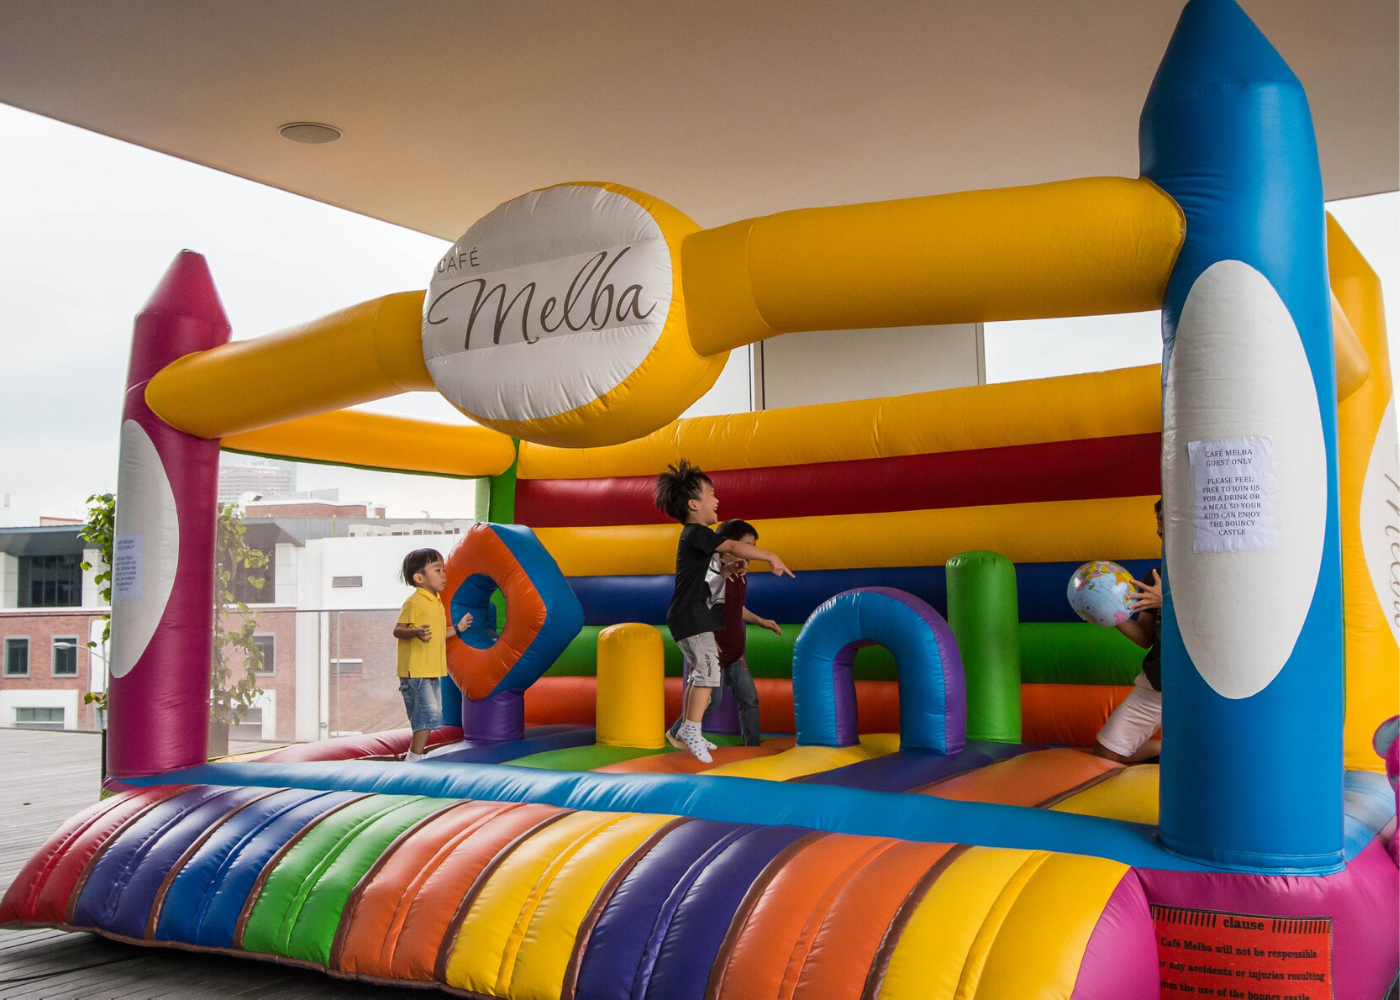 bouncy-castle-at-cafe-melba